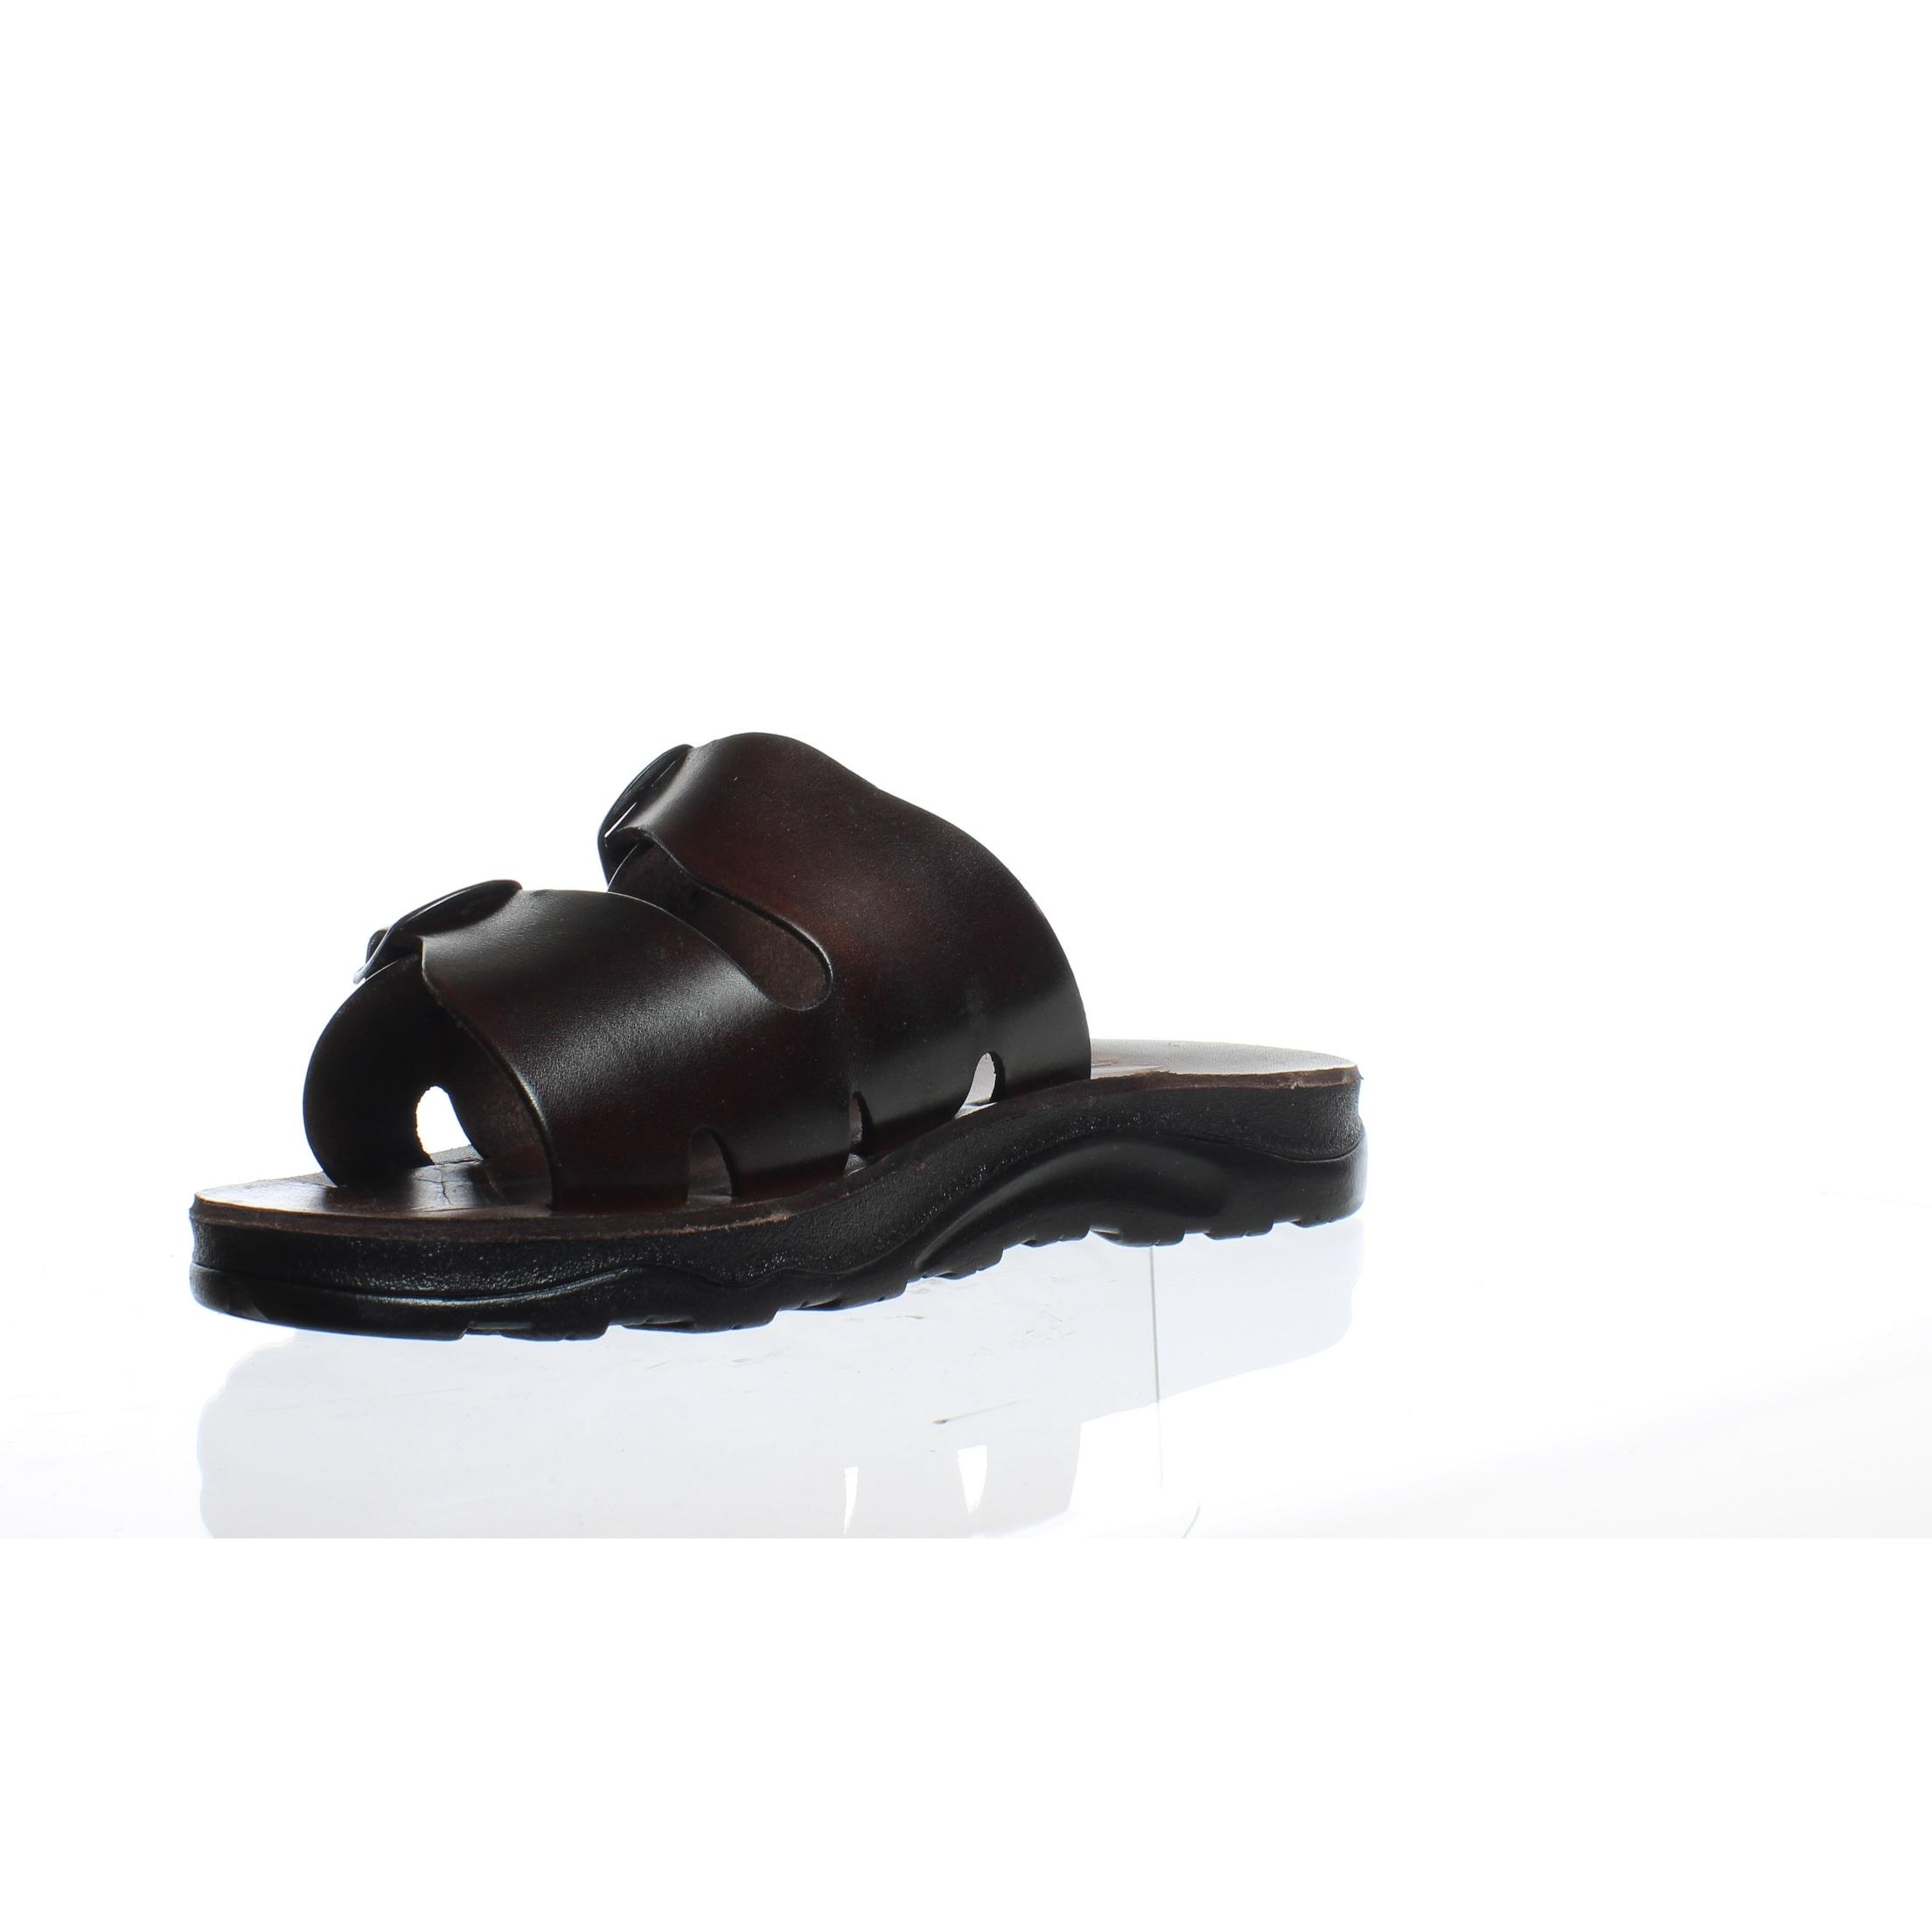 f989daaed1fa55 Shop Jerusalem Sandals Mens 108D Brown Slides EUR 44 - On Sale - Free  Shipping On Orders Over  45 - Overstock - 25461330